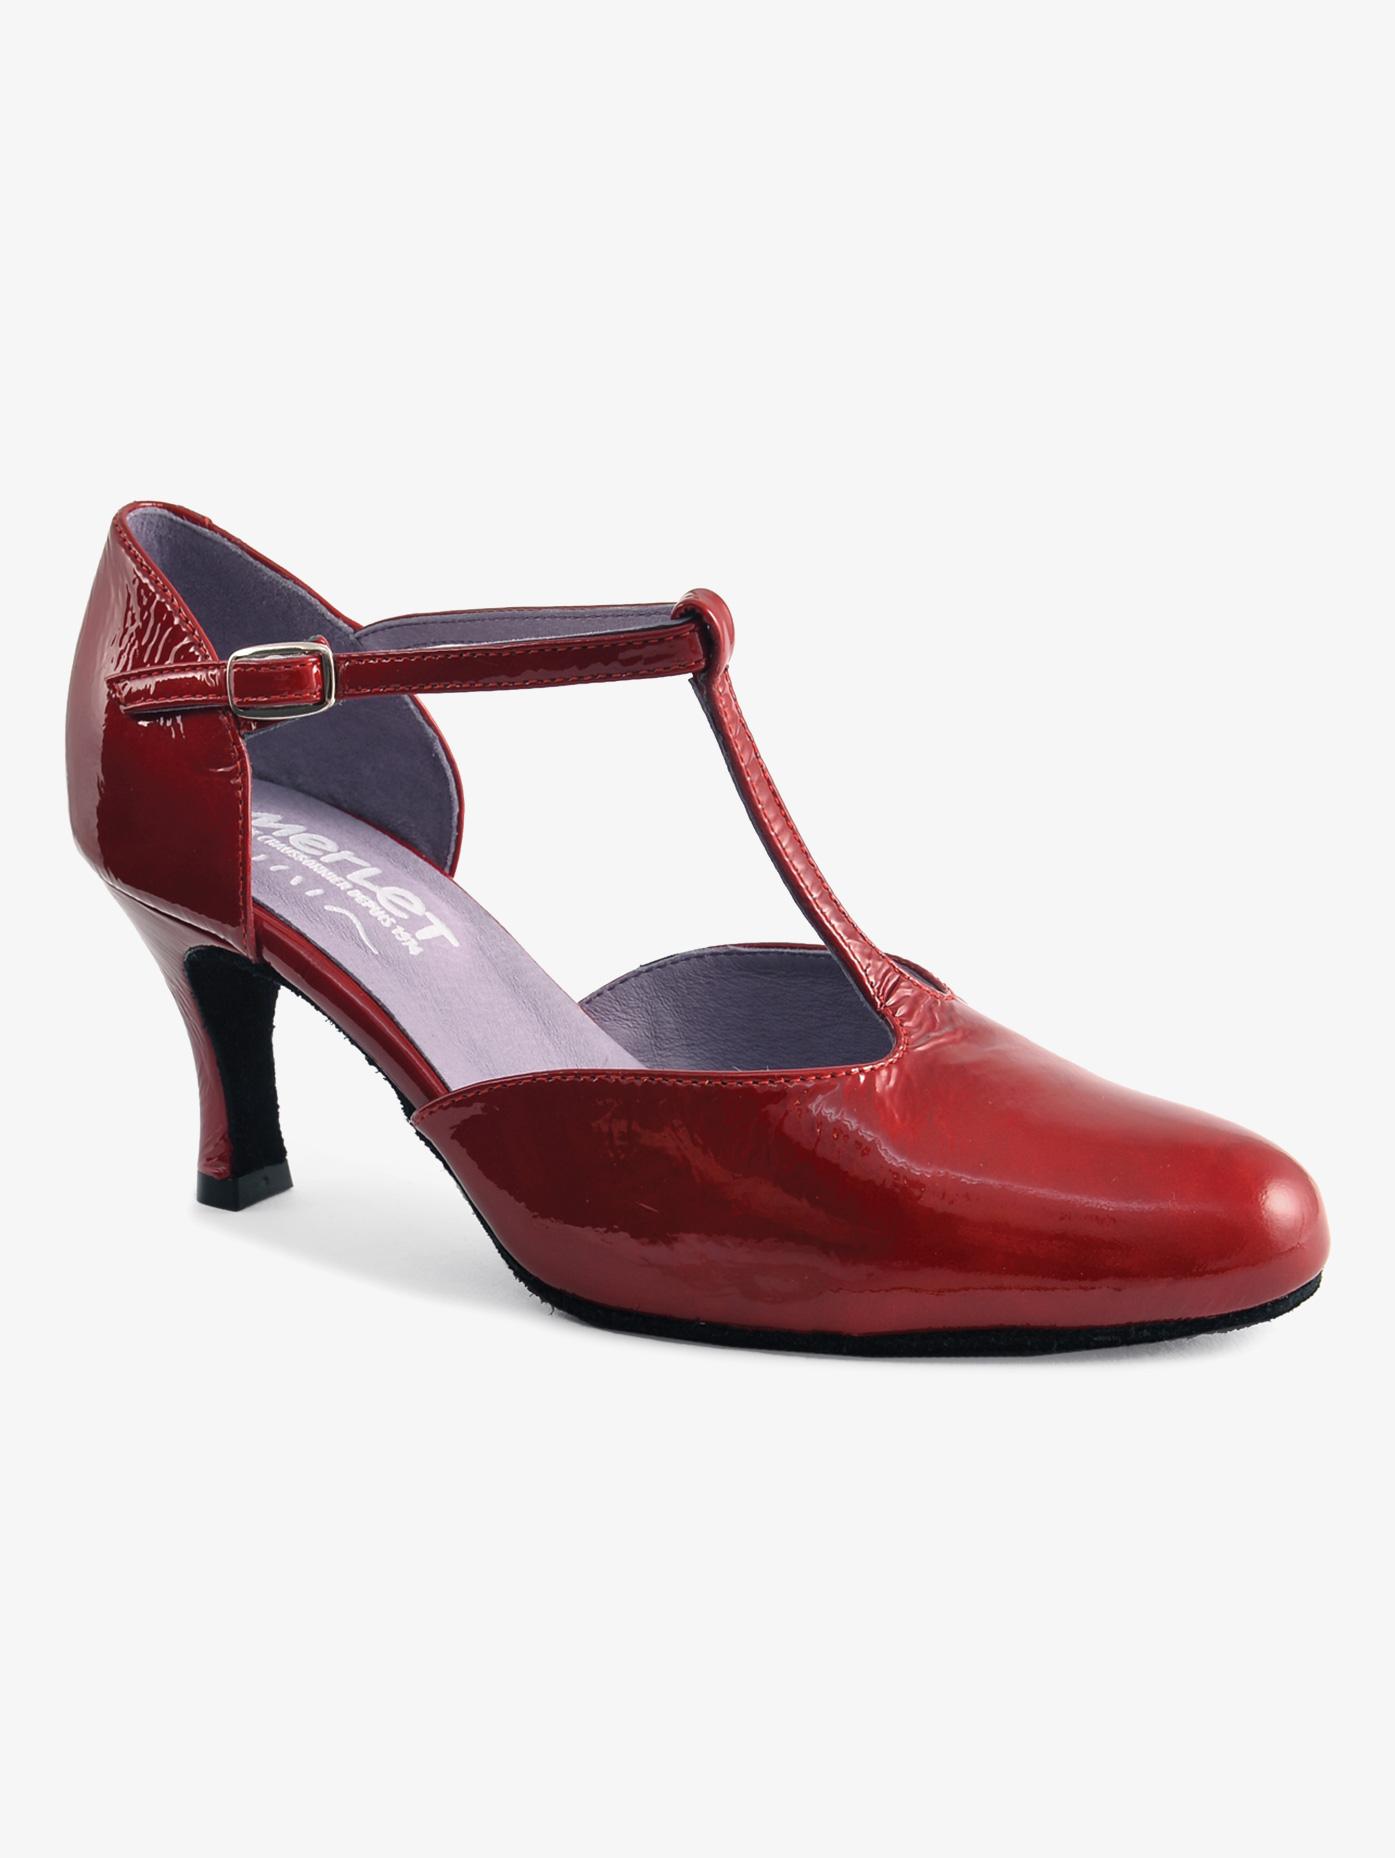 Merlet Womens Nina Patent Leather Ballroom Shoes NINA